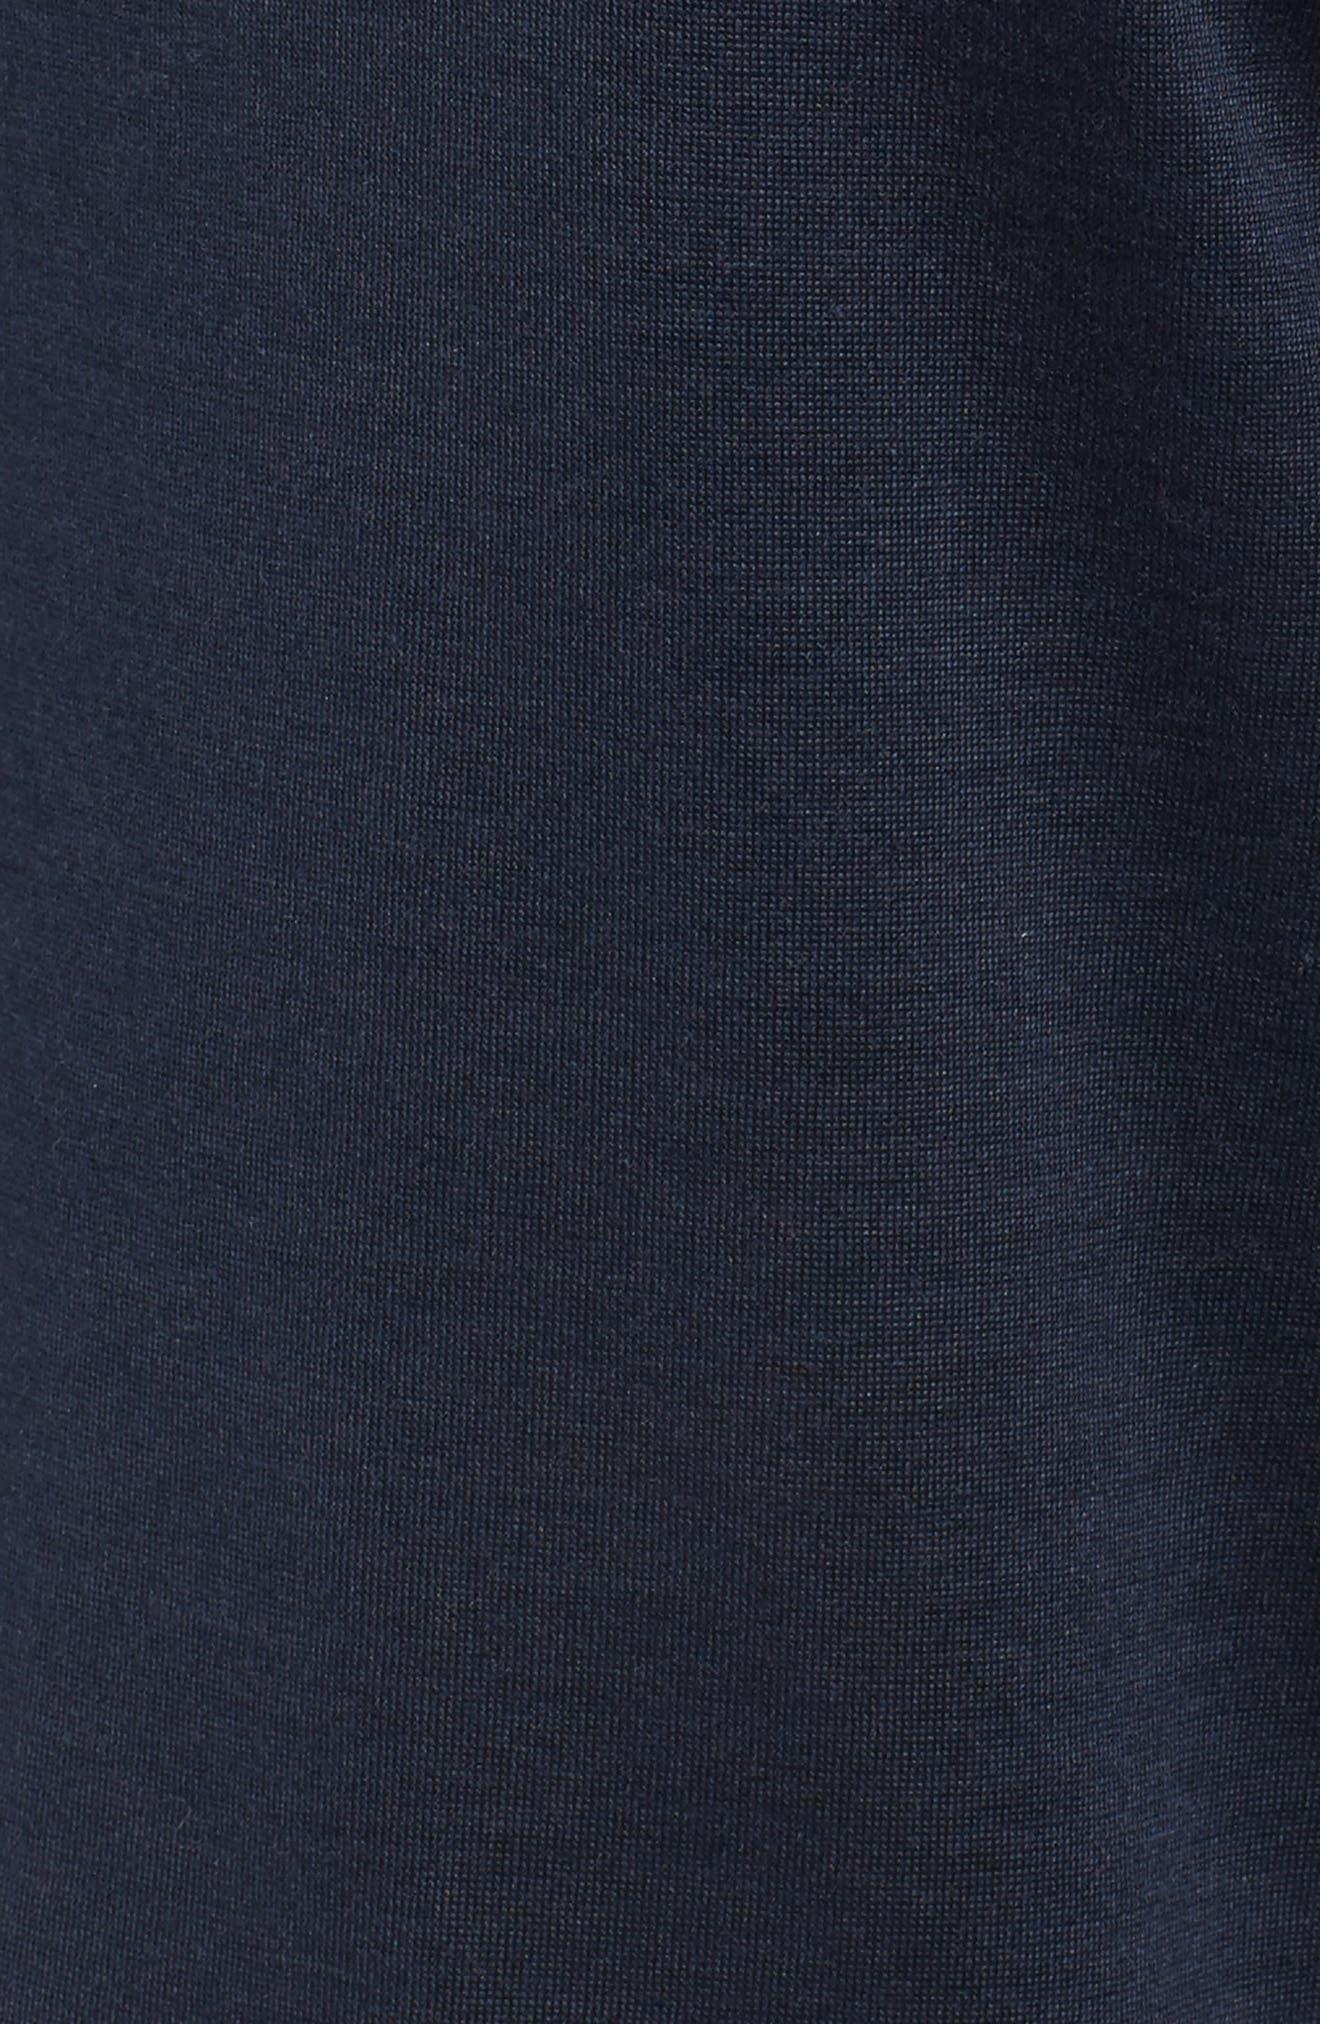 Silk & Cotton Lounge Shorts,                             Alternate thumbnail 5, color,                             409